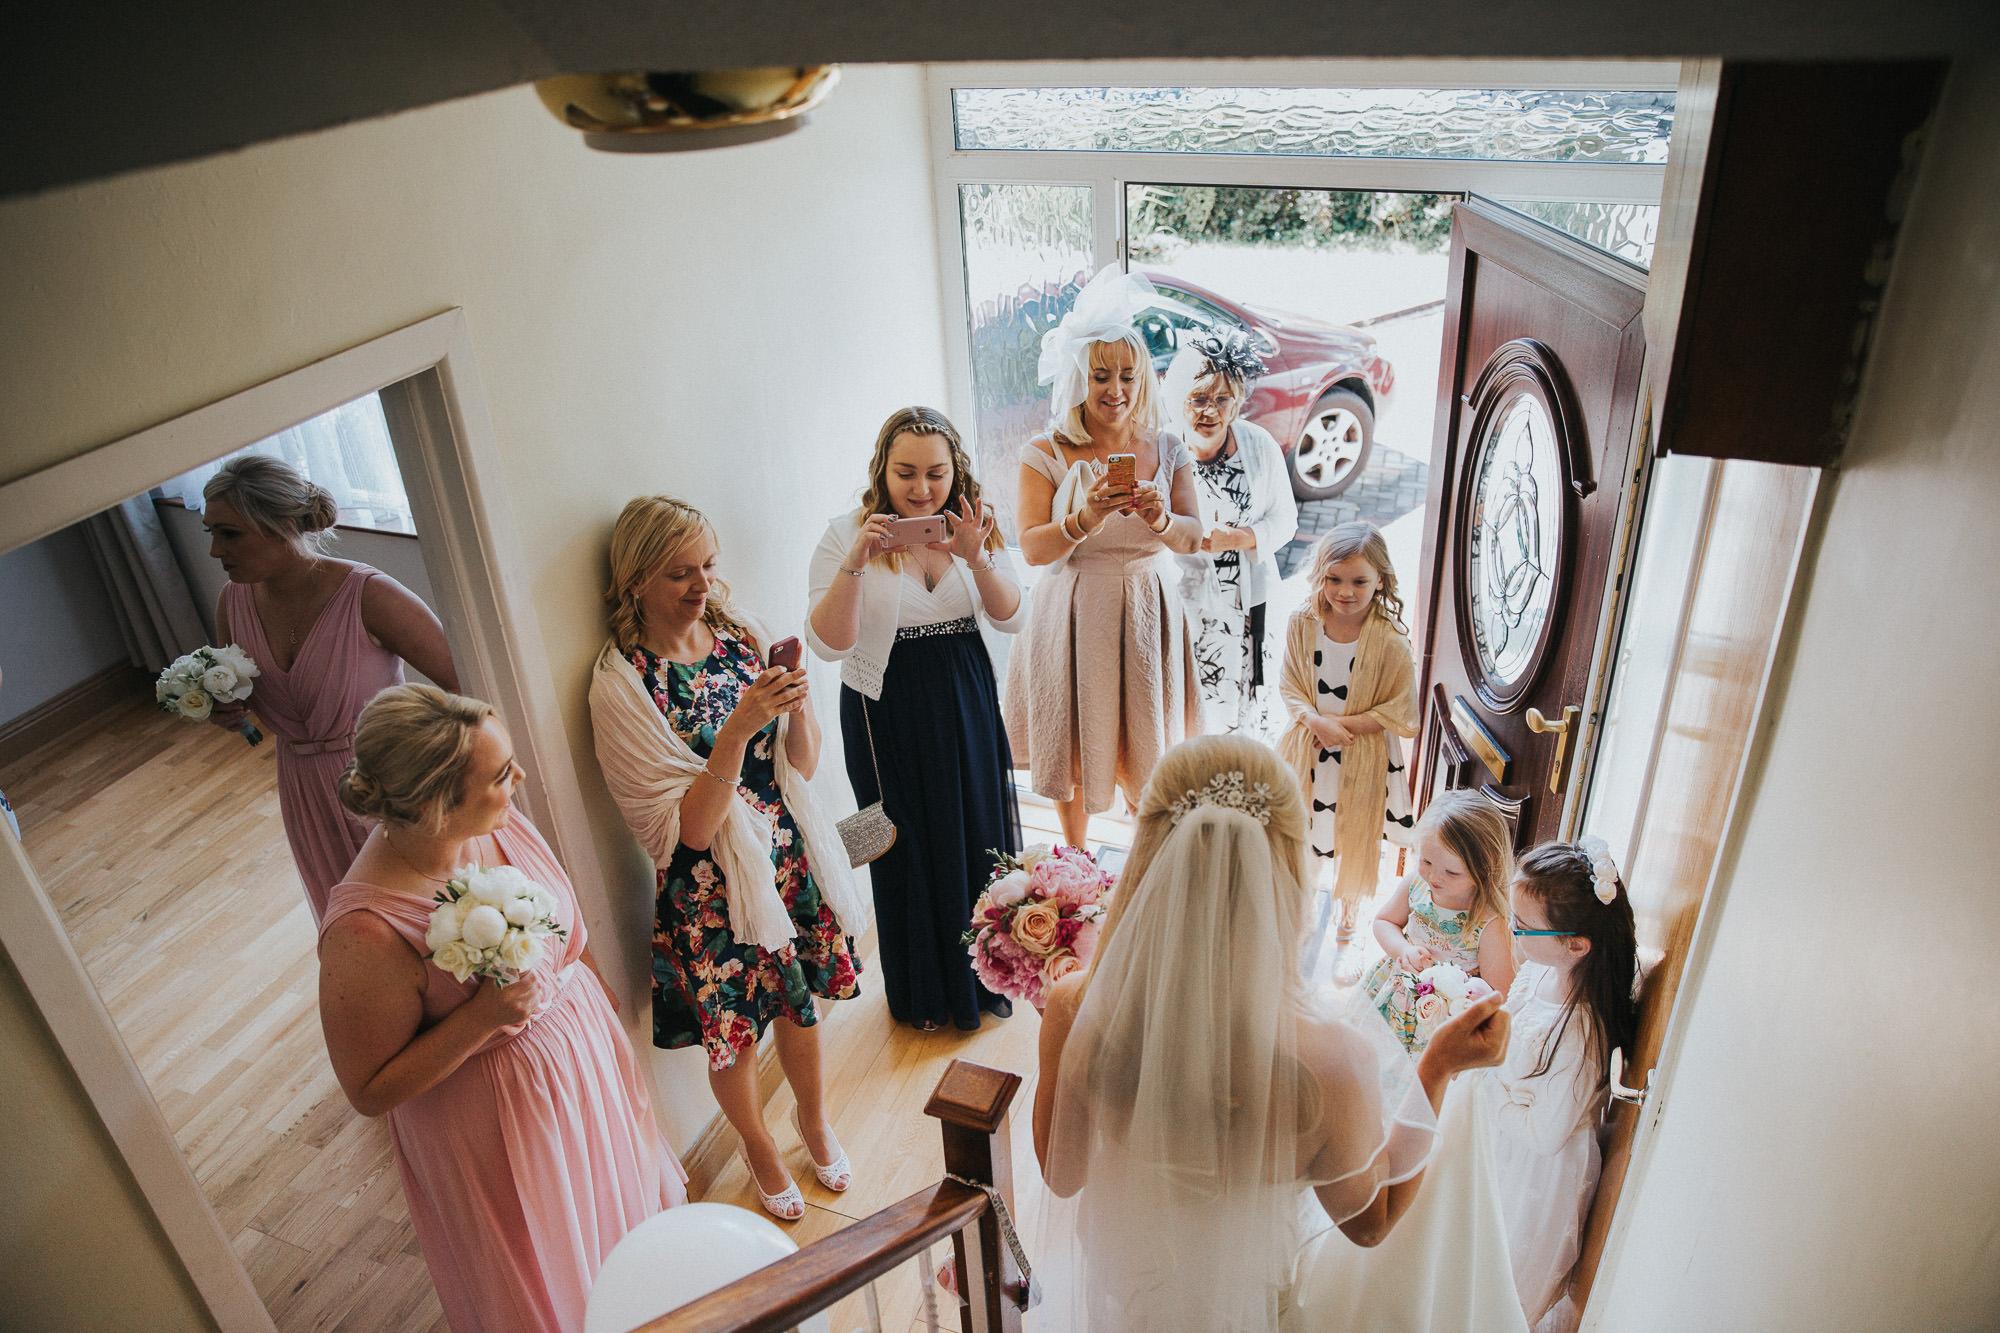 CLAIREBYRNEPHOTOGRAPHY-WEDDING-Ireland-tulffaris-alternative-fun-Lisa-terry-2.jpg